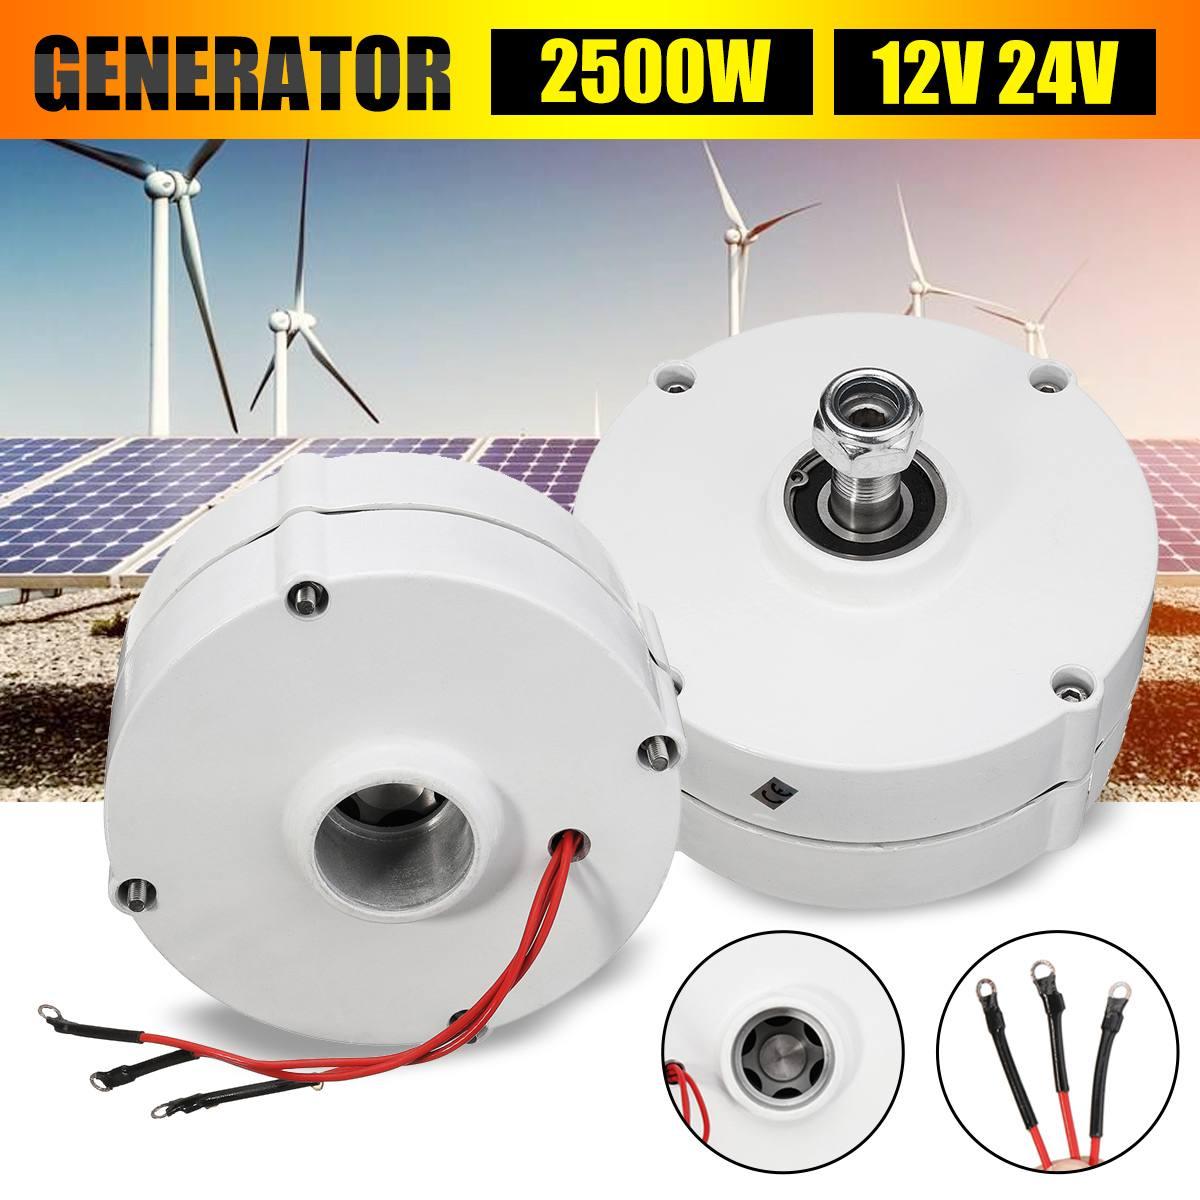 Efficient Wind Generator Motor 2500W 12V 24V High efficiency For DIY Wind Turbines Blade Controller 3 Phase Current PMSG